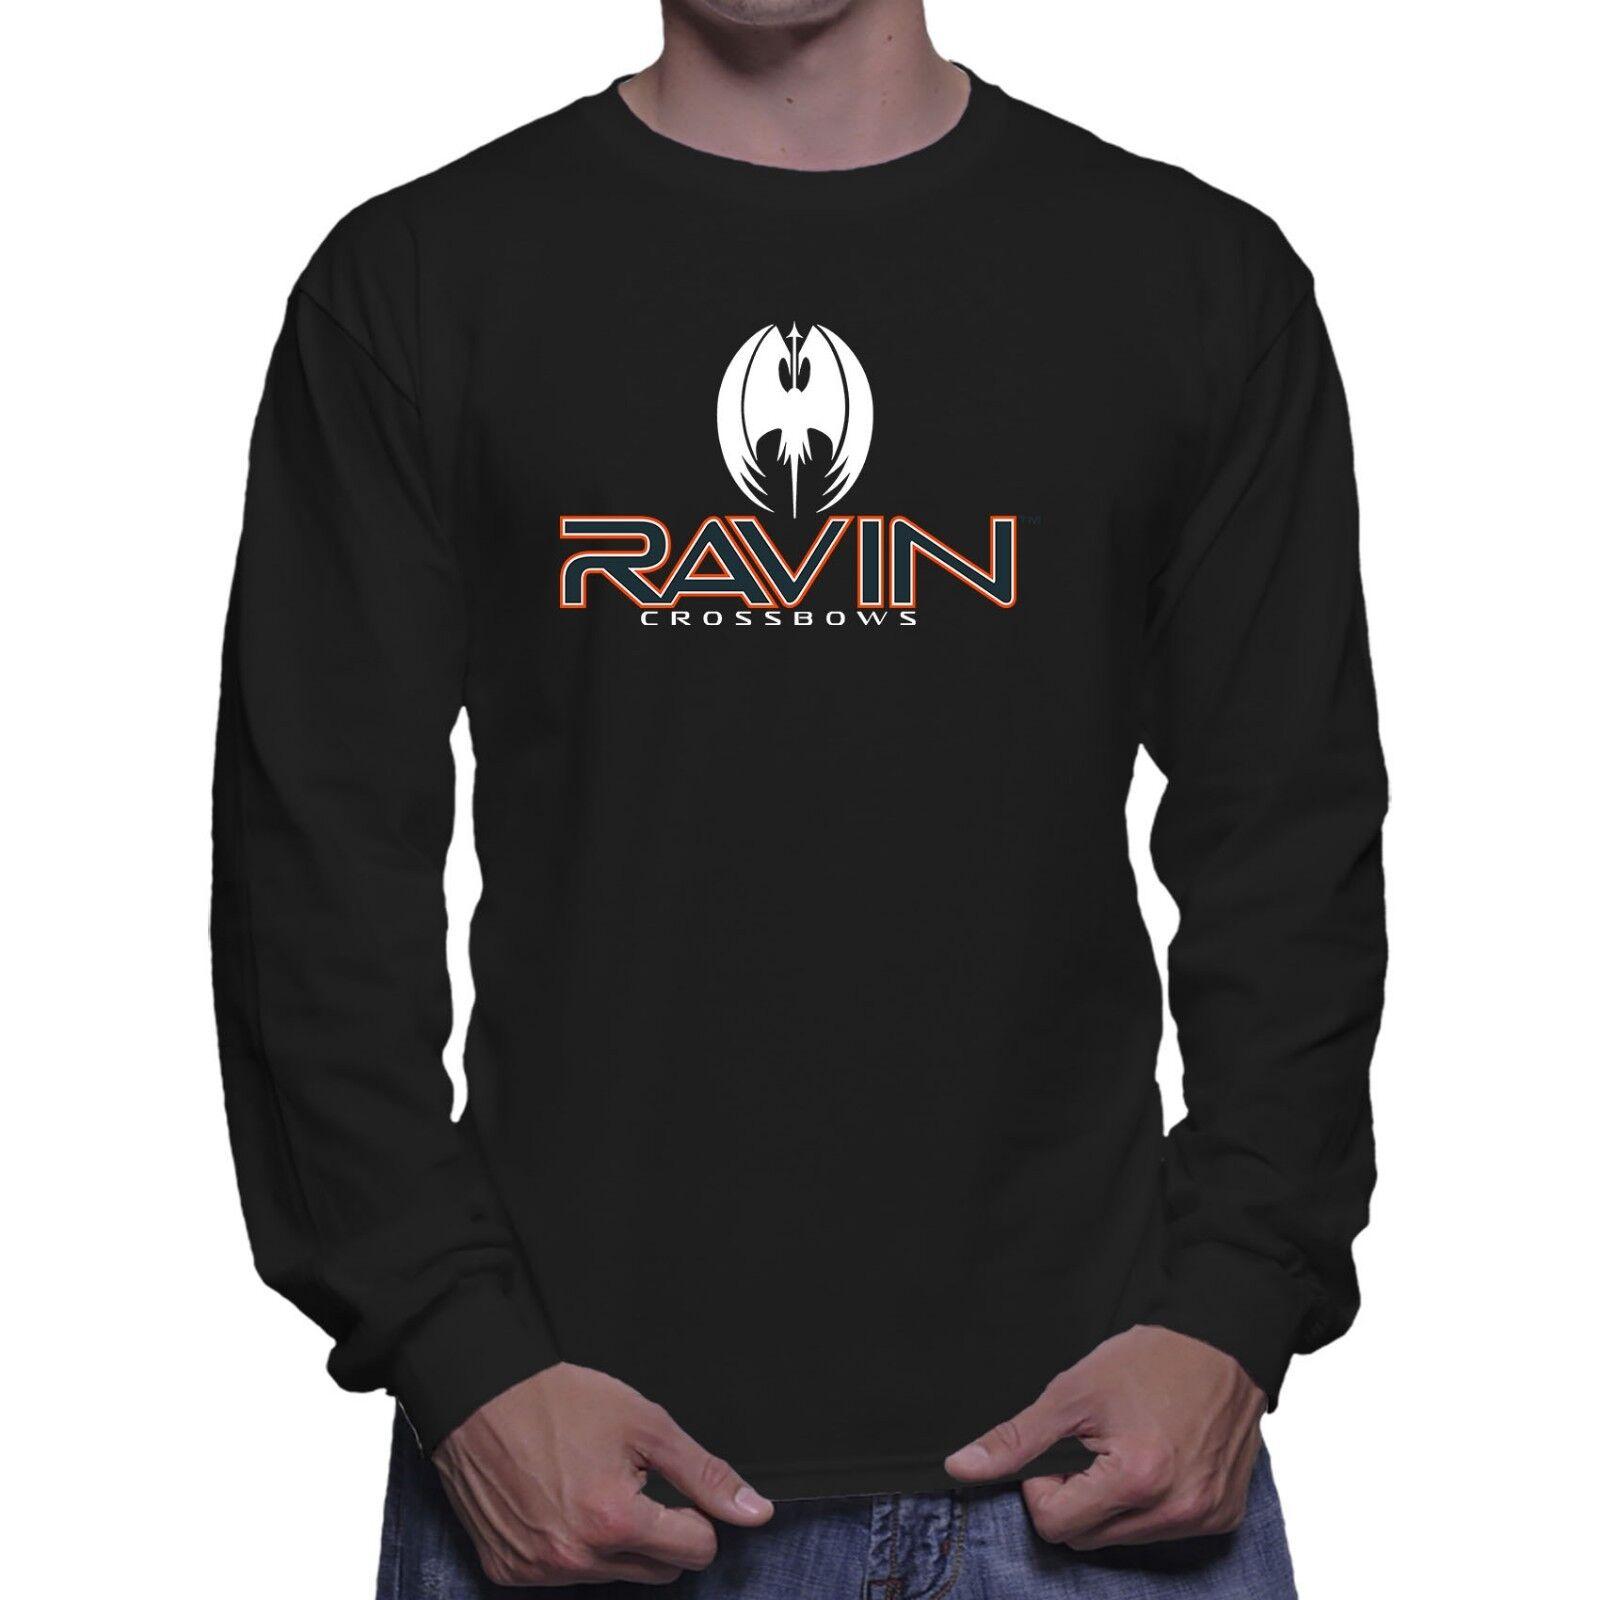 ravin crossbow hunting long sleeve black t